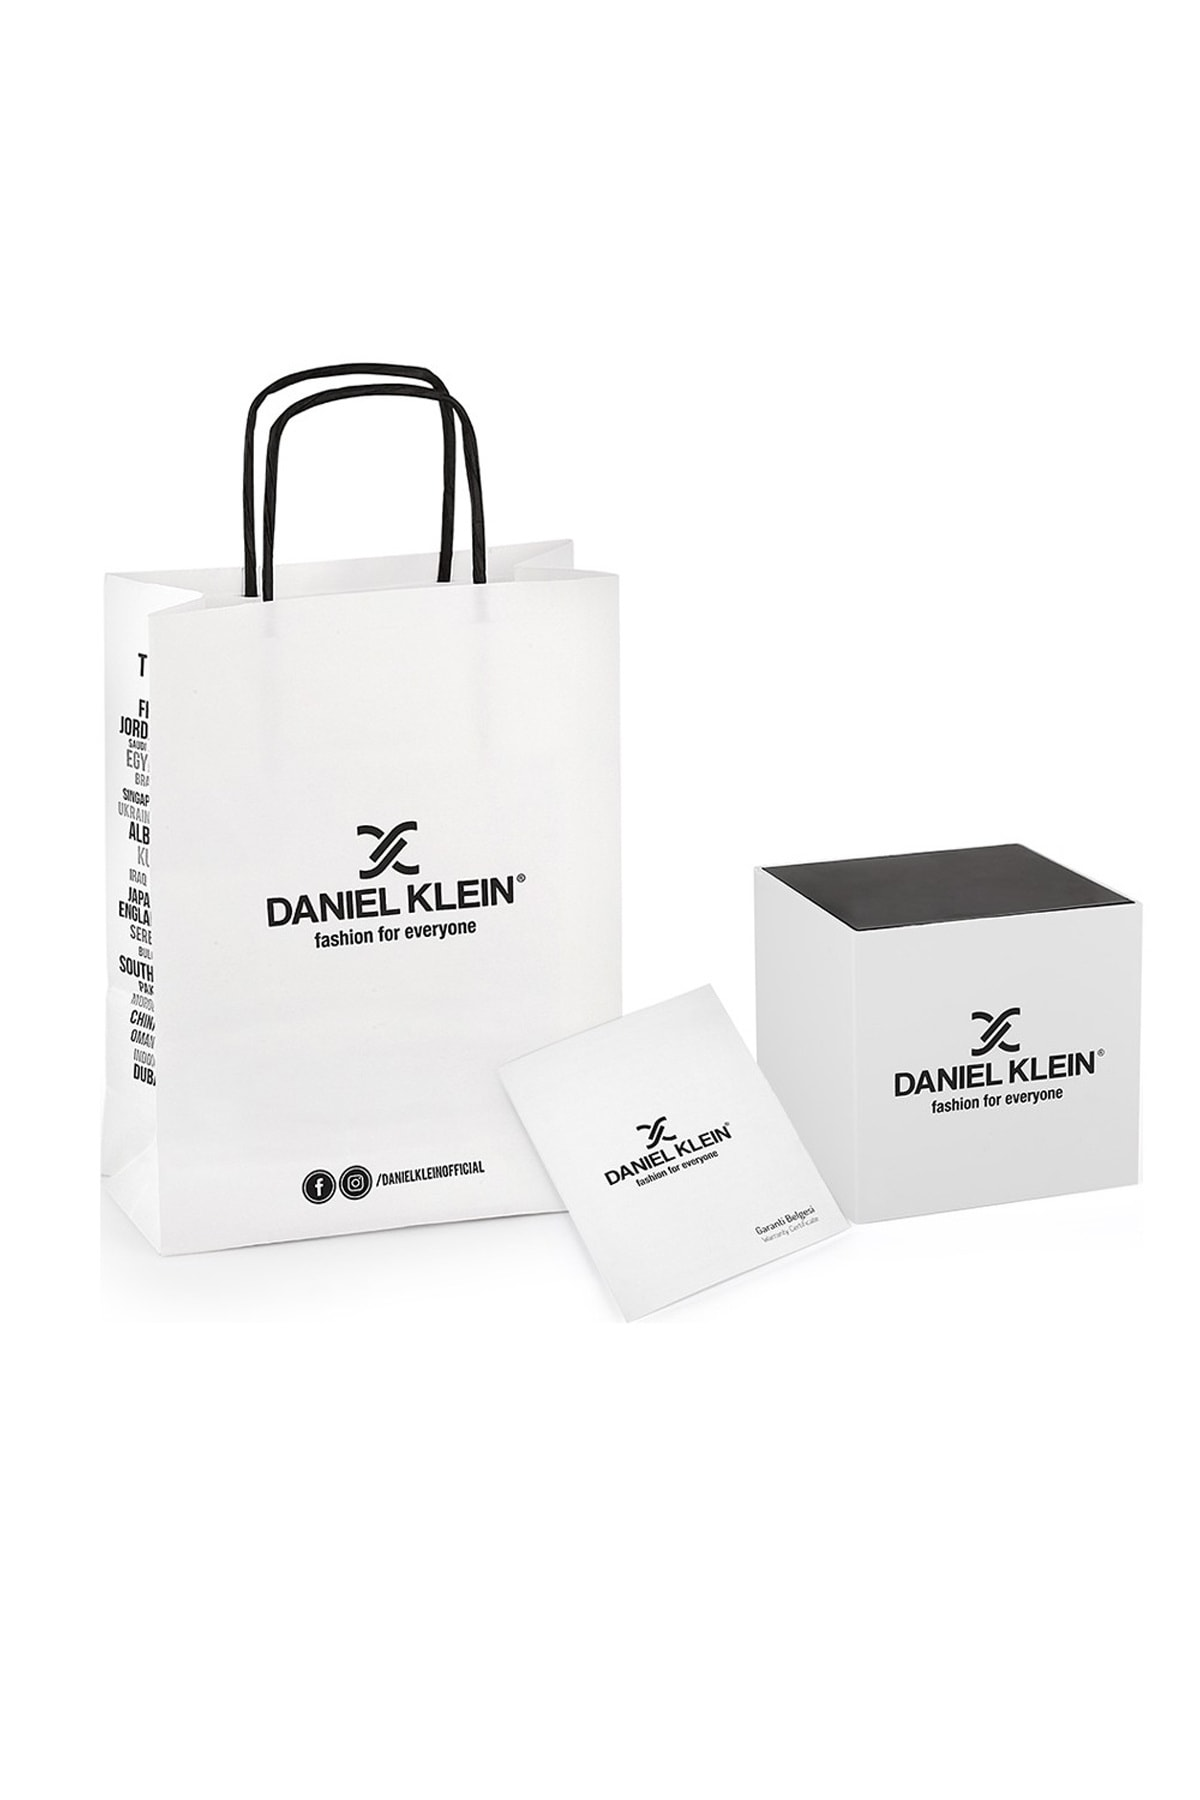 new 2021 Daniel Klein Women's Watch + wristband Gift enlarge